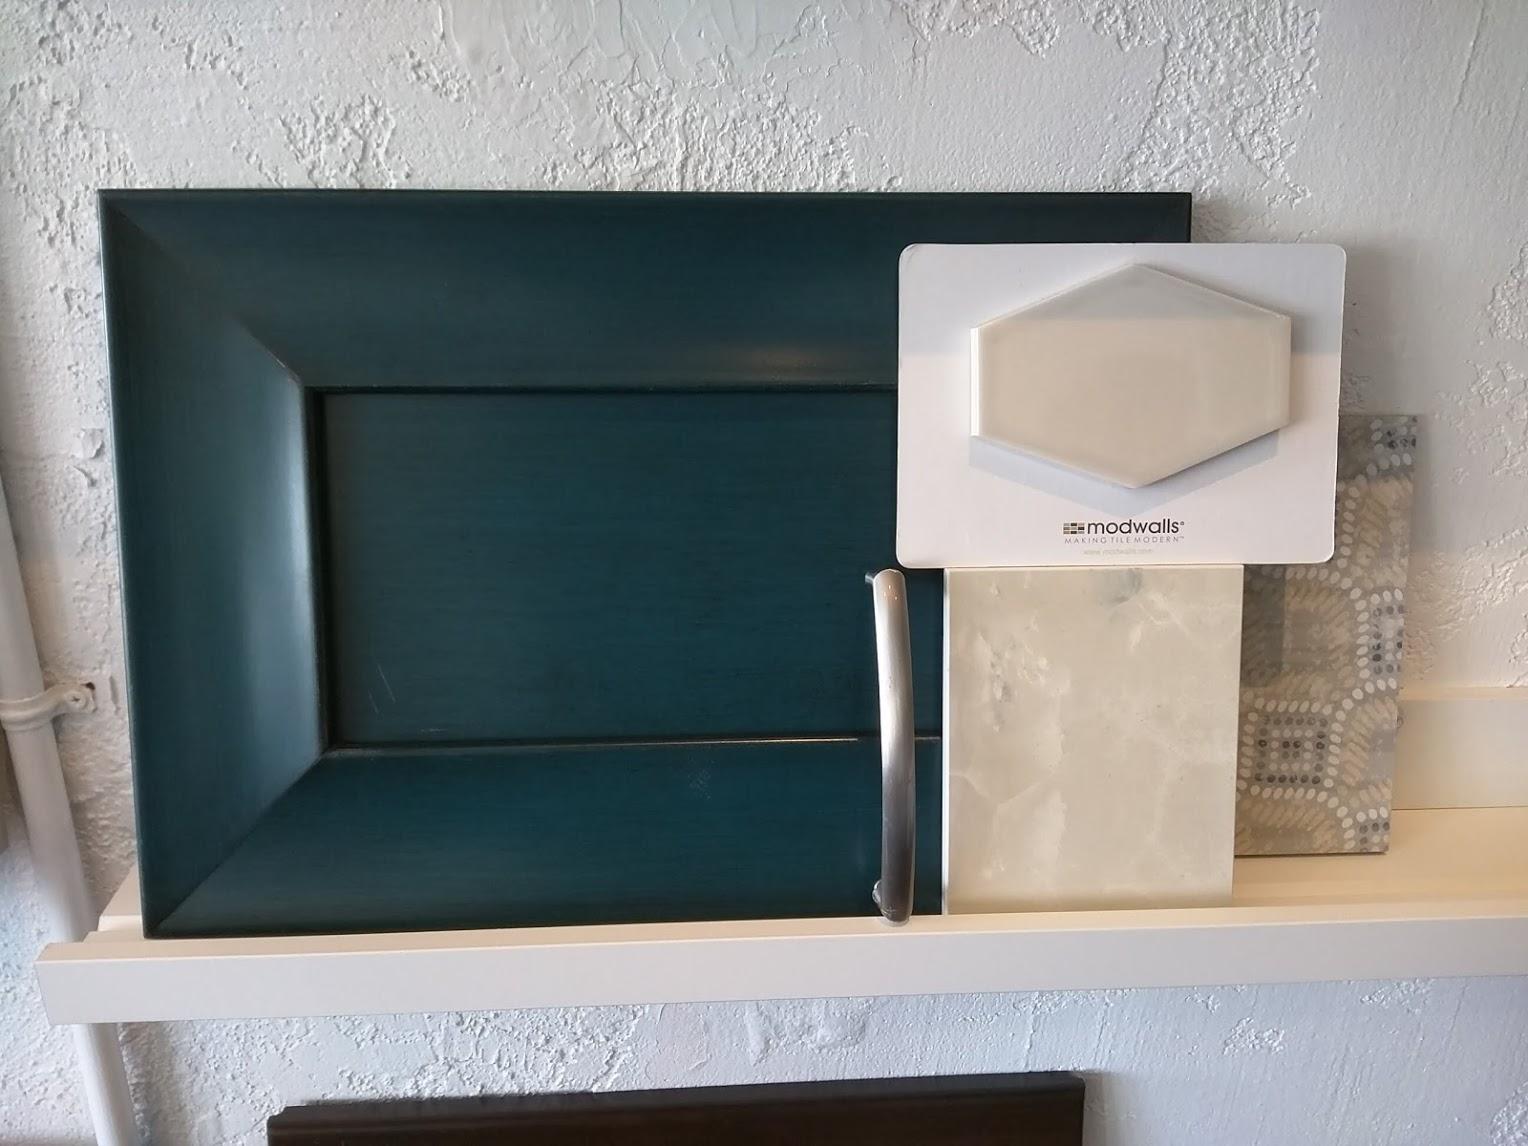 Sample display of cabinetry, wall tile/backsplash, flooring and countertop